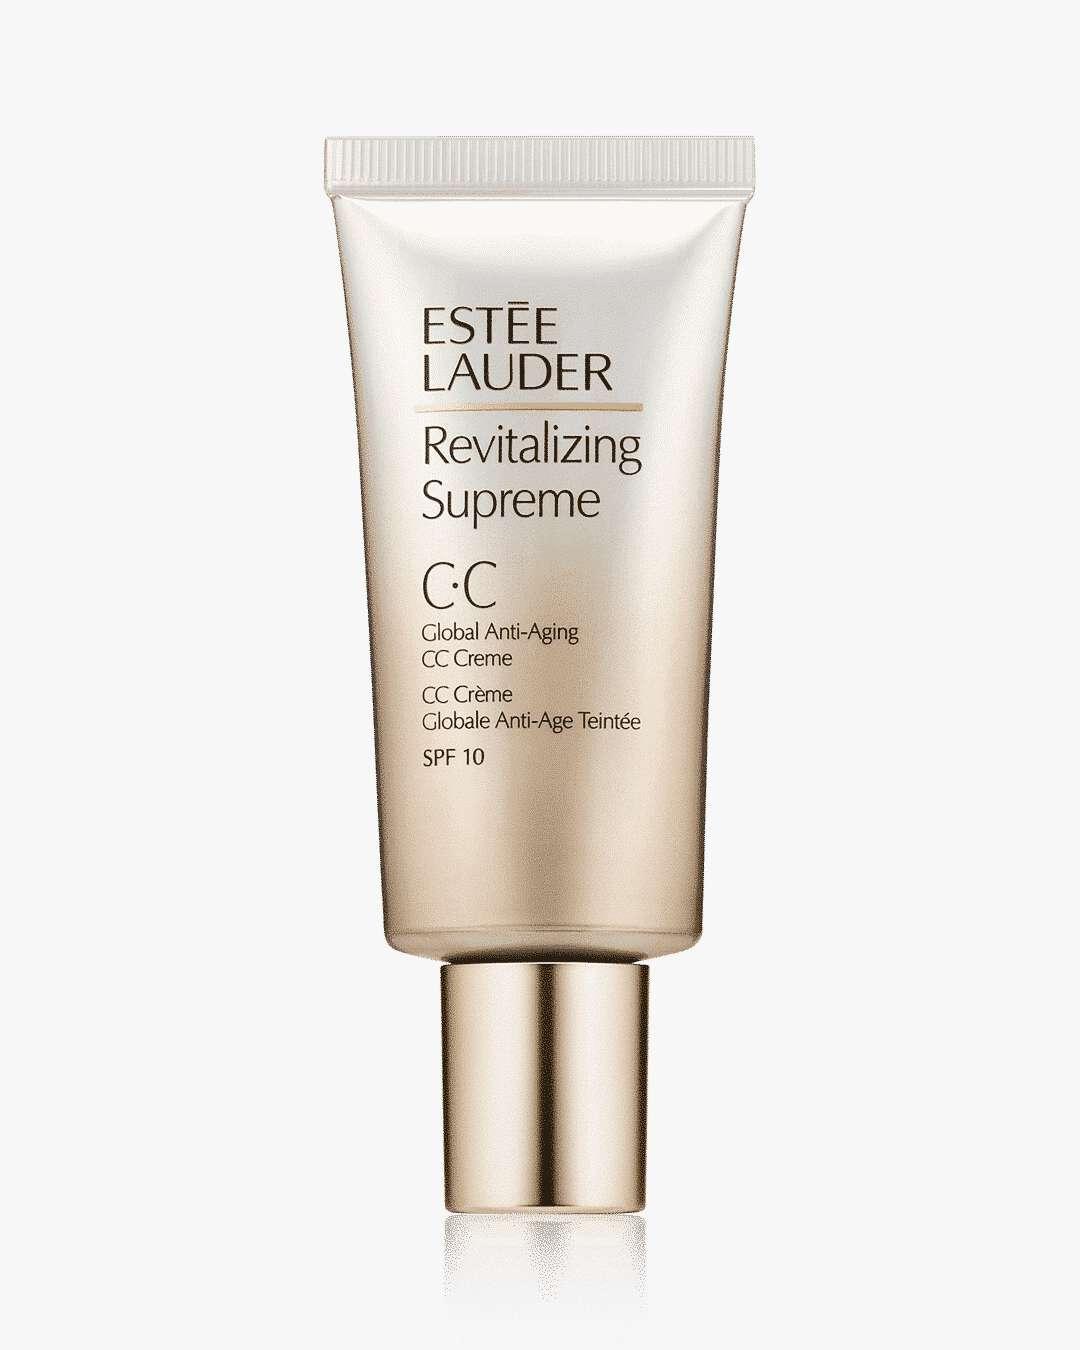 Produktbilde for Revitalizing Supreme Anti-aging CC Creme SPF10 30ml hos Fredrik & Louisa